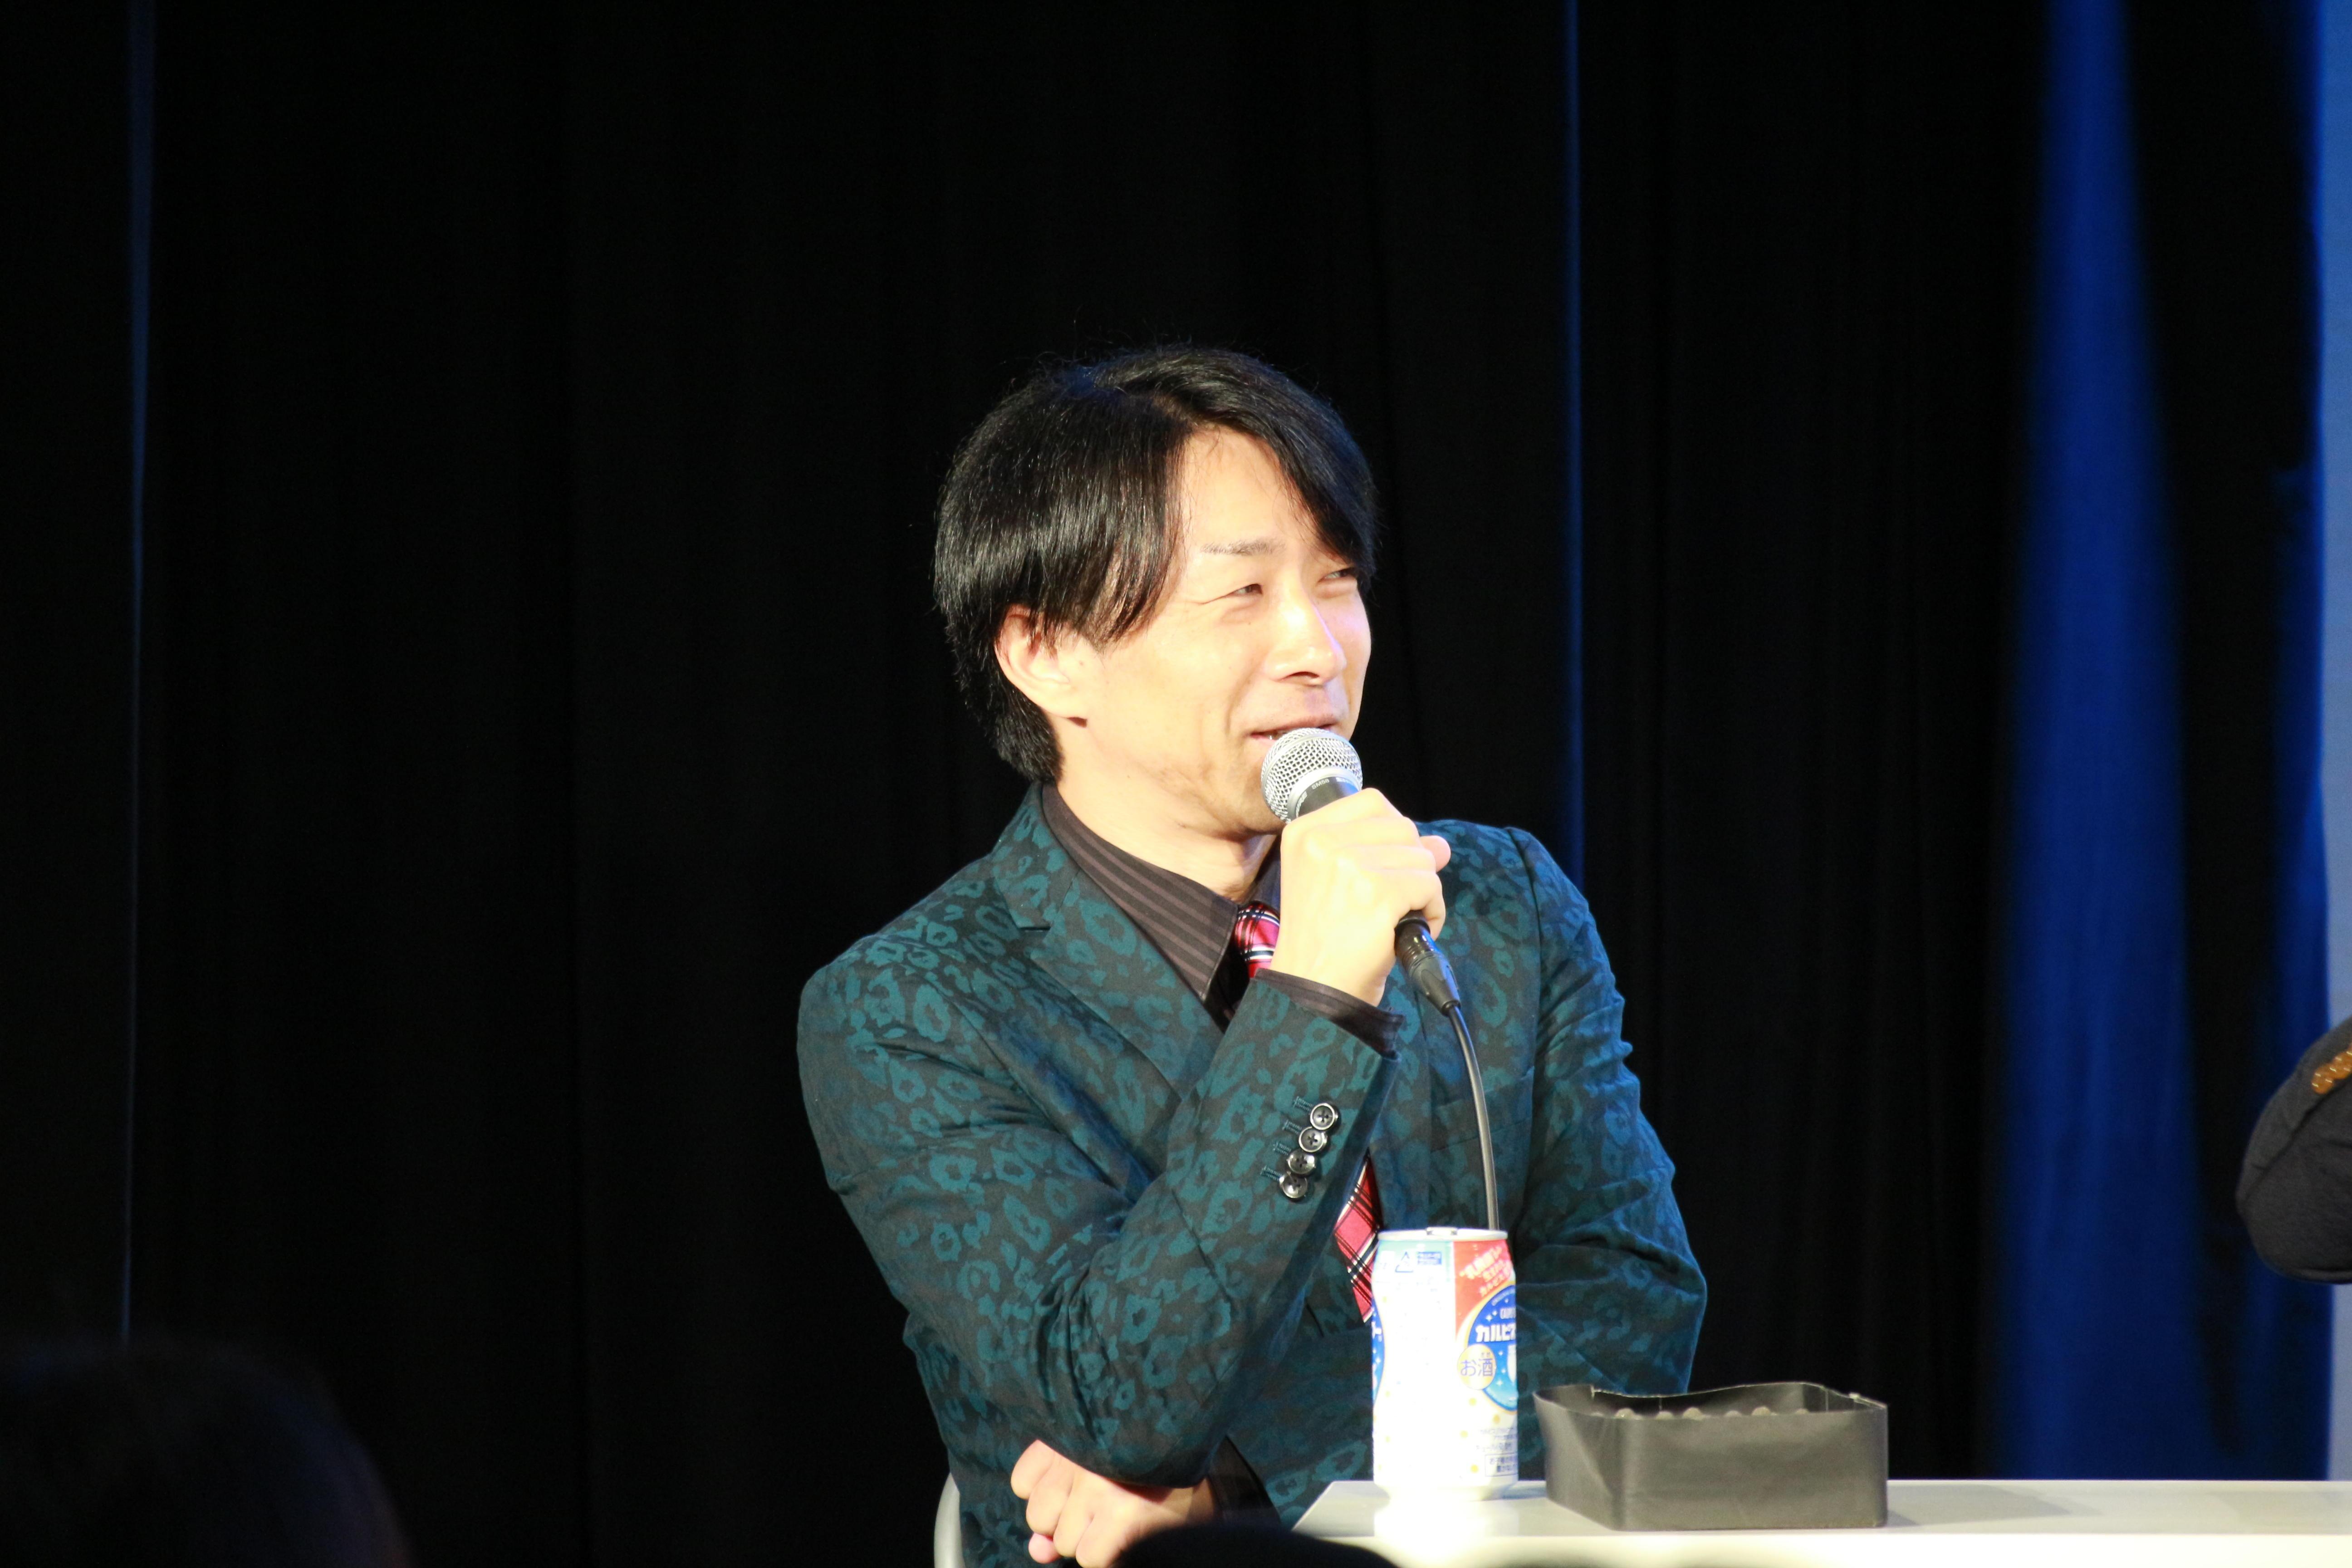 http://news.yoshimoto.co.jp/20180512231831-3f07312fcaf850fbac7380b11cdbe470ddbe6230.jpg